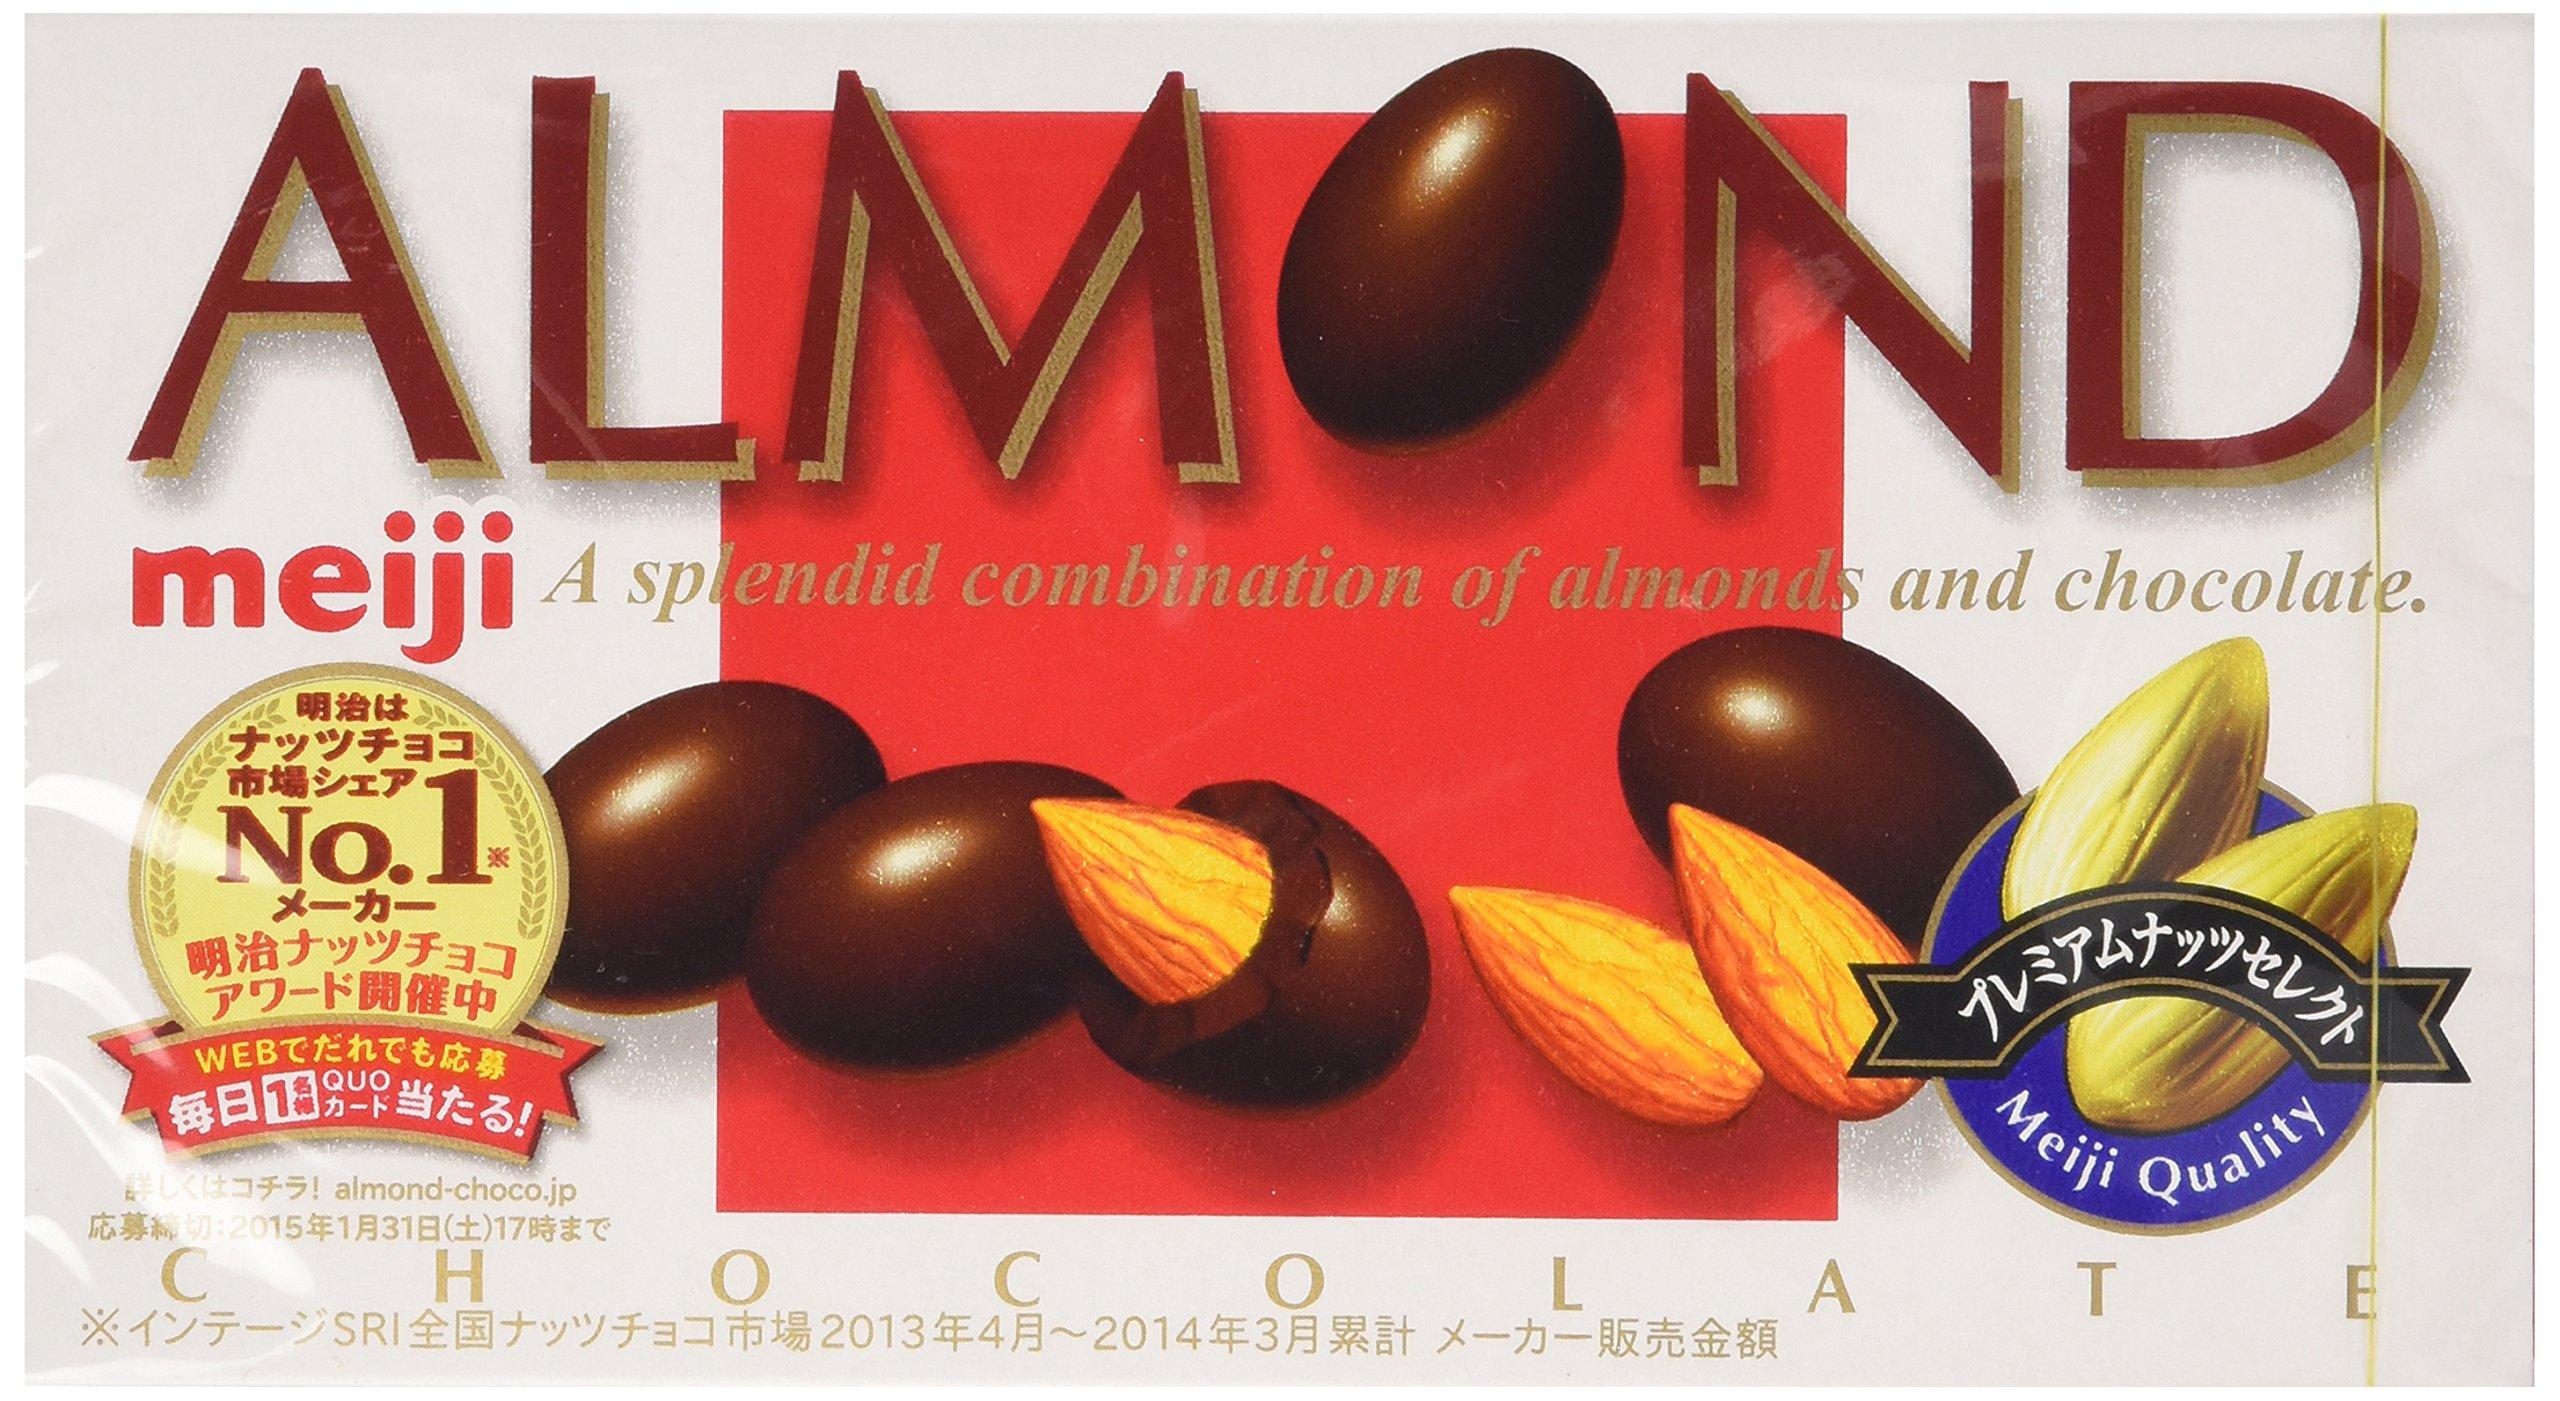 Meiji Choco Almond, 3.10-Ounce Units (Pack of 10) by Meiji